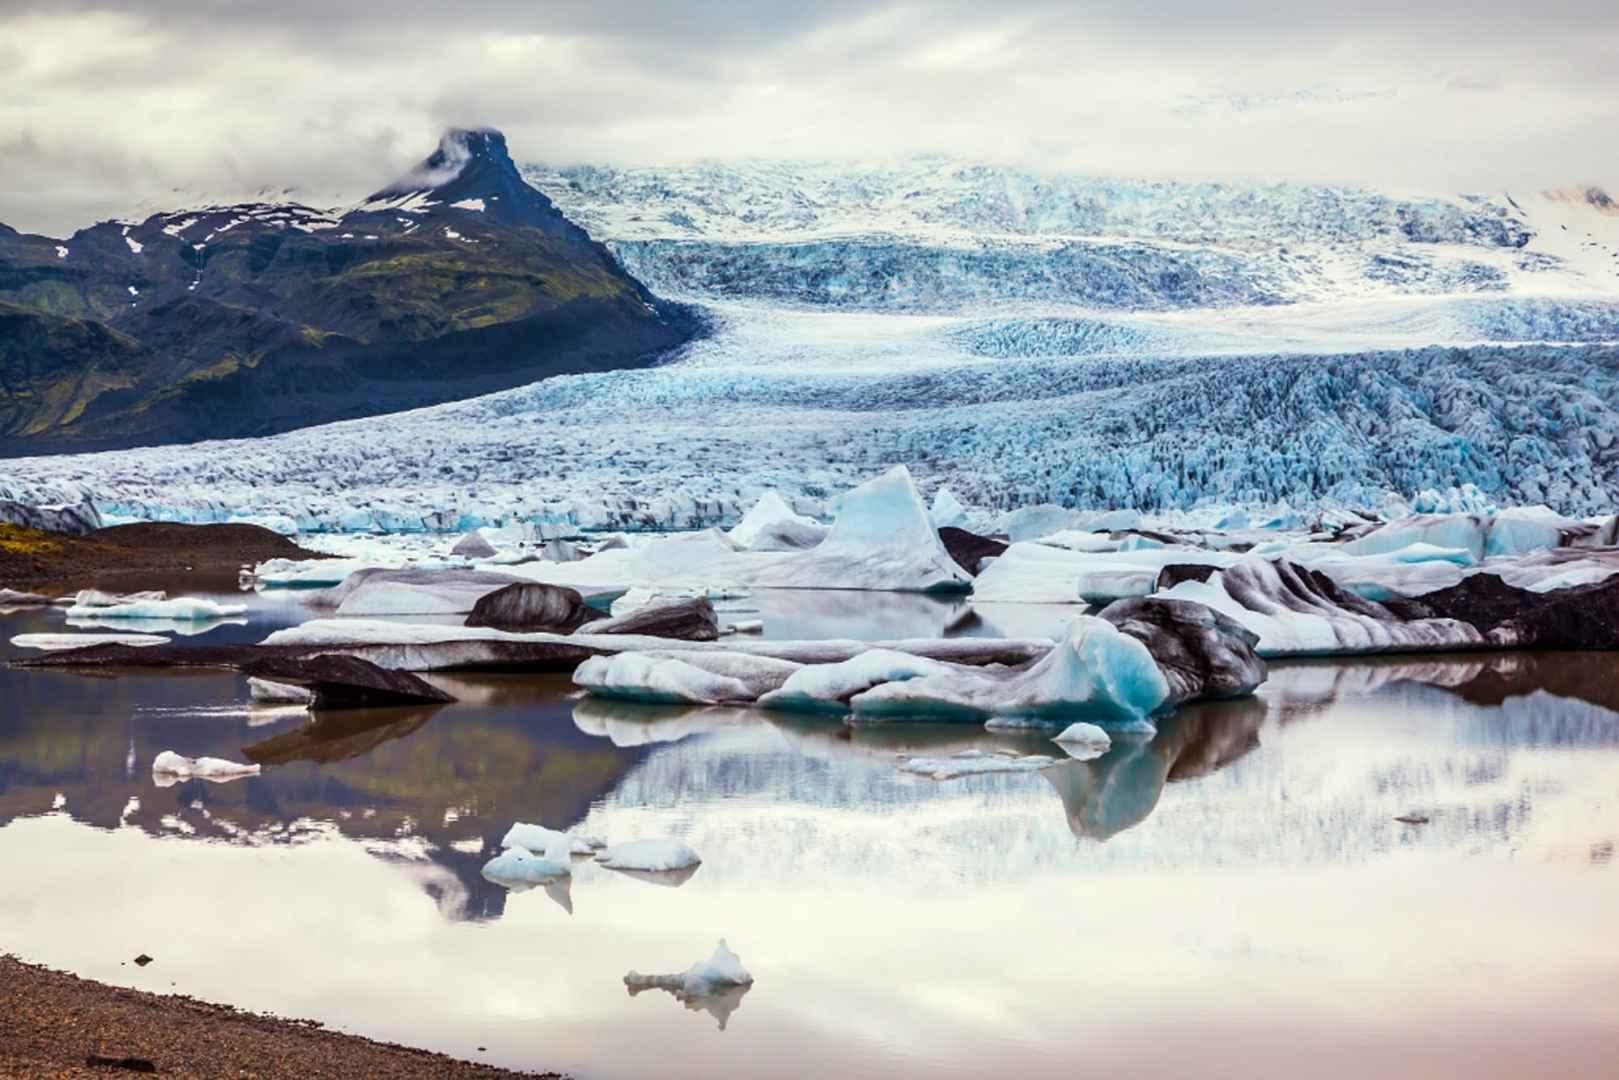 greenland iceland trip